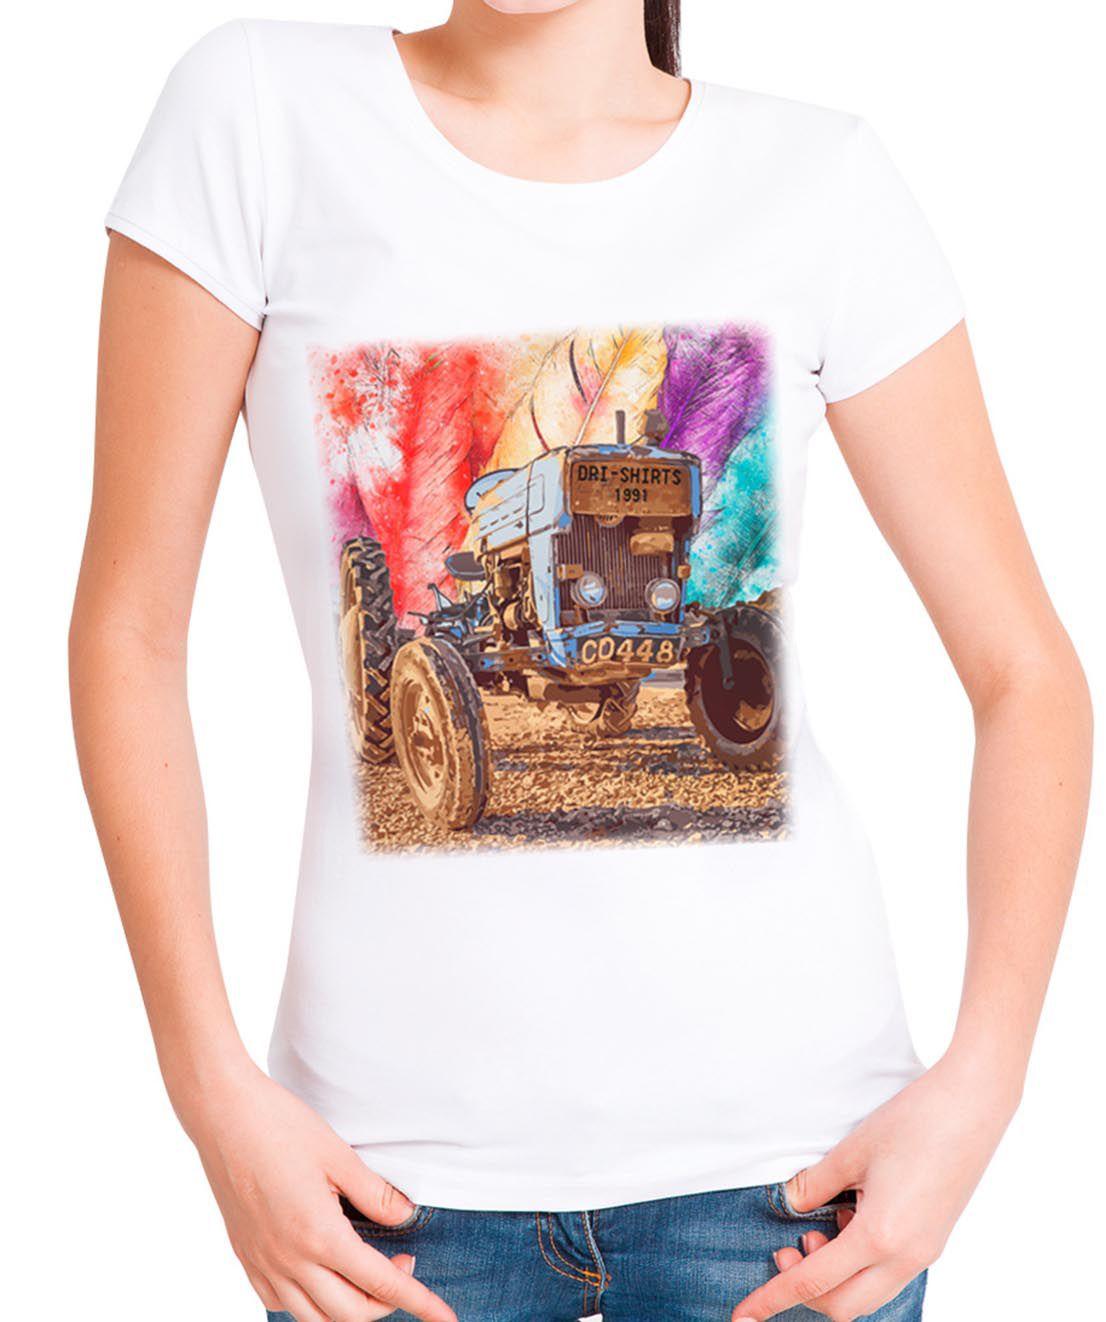 Blusa T-Shirt OutletDri Estampa Trator Arco-Iris Branca